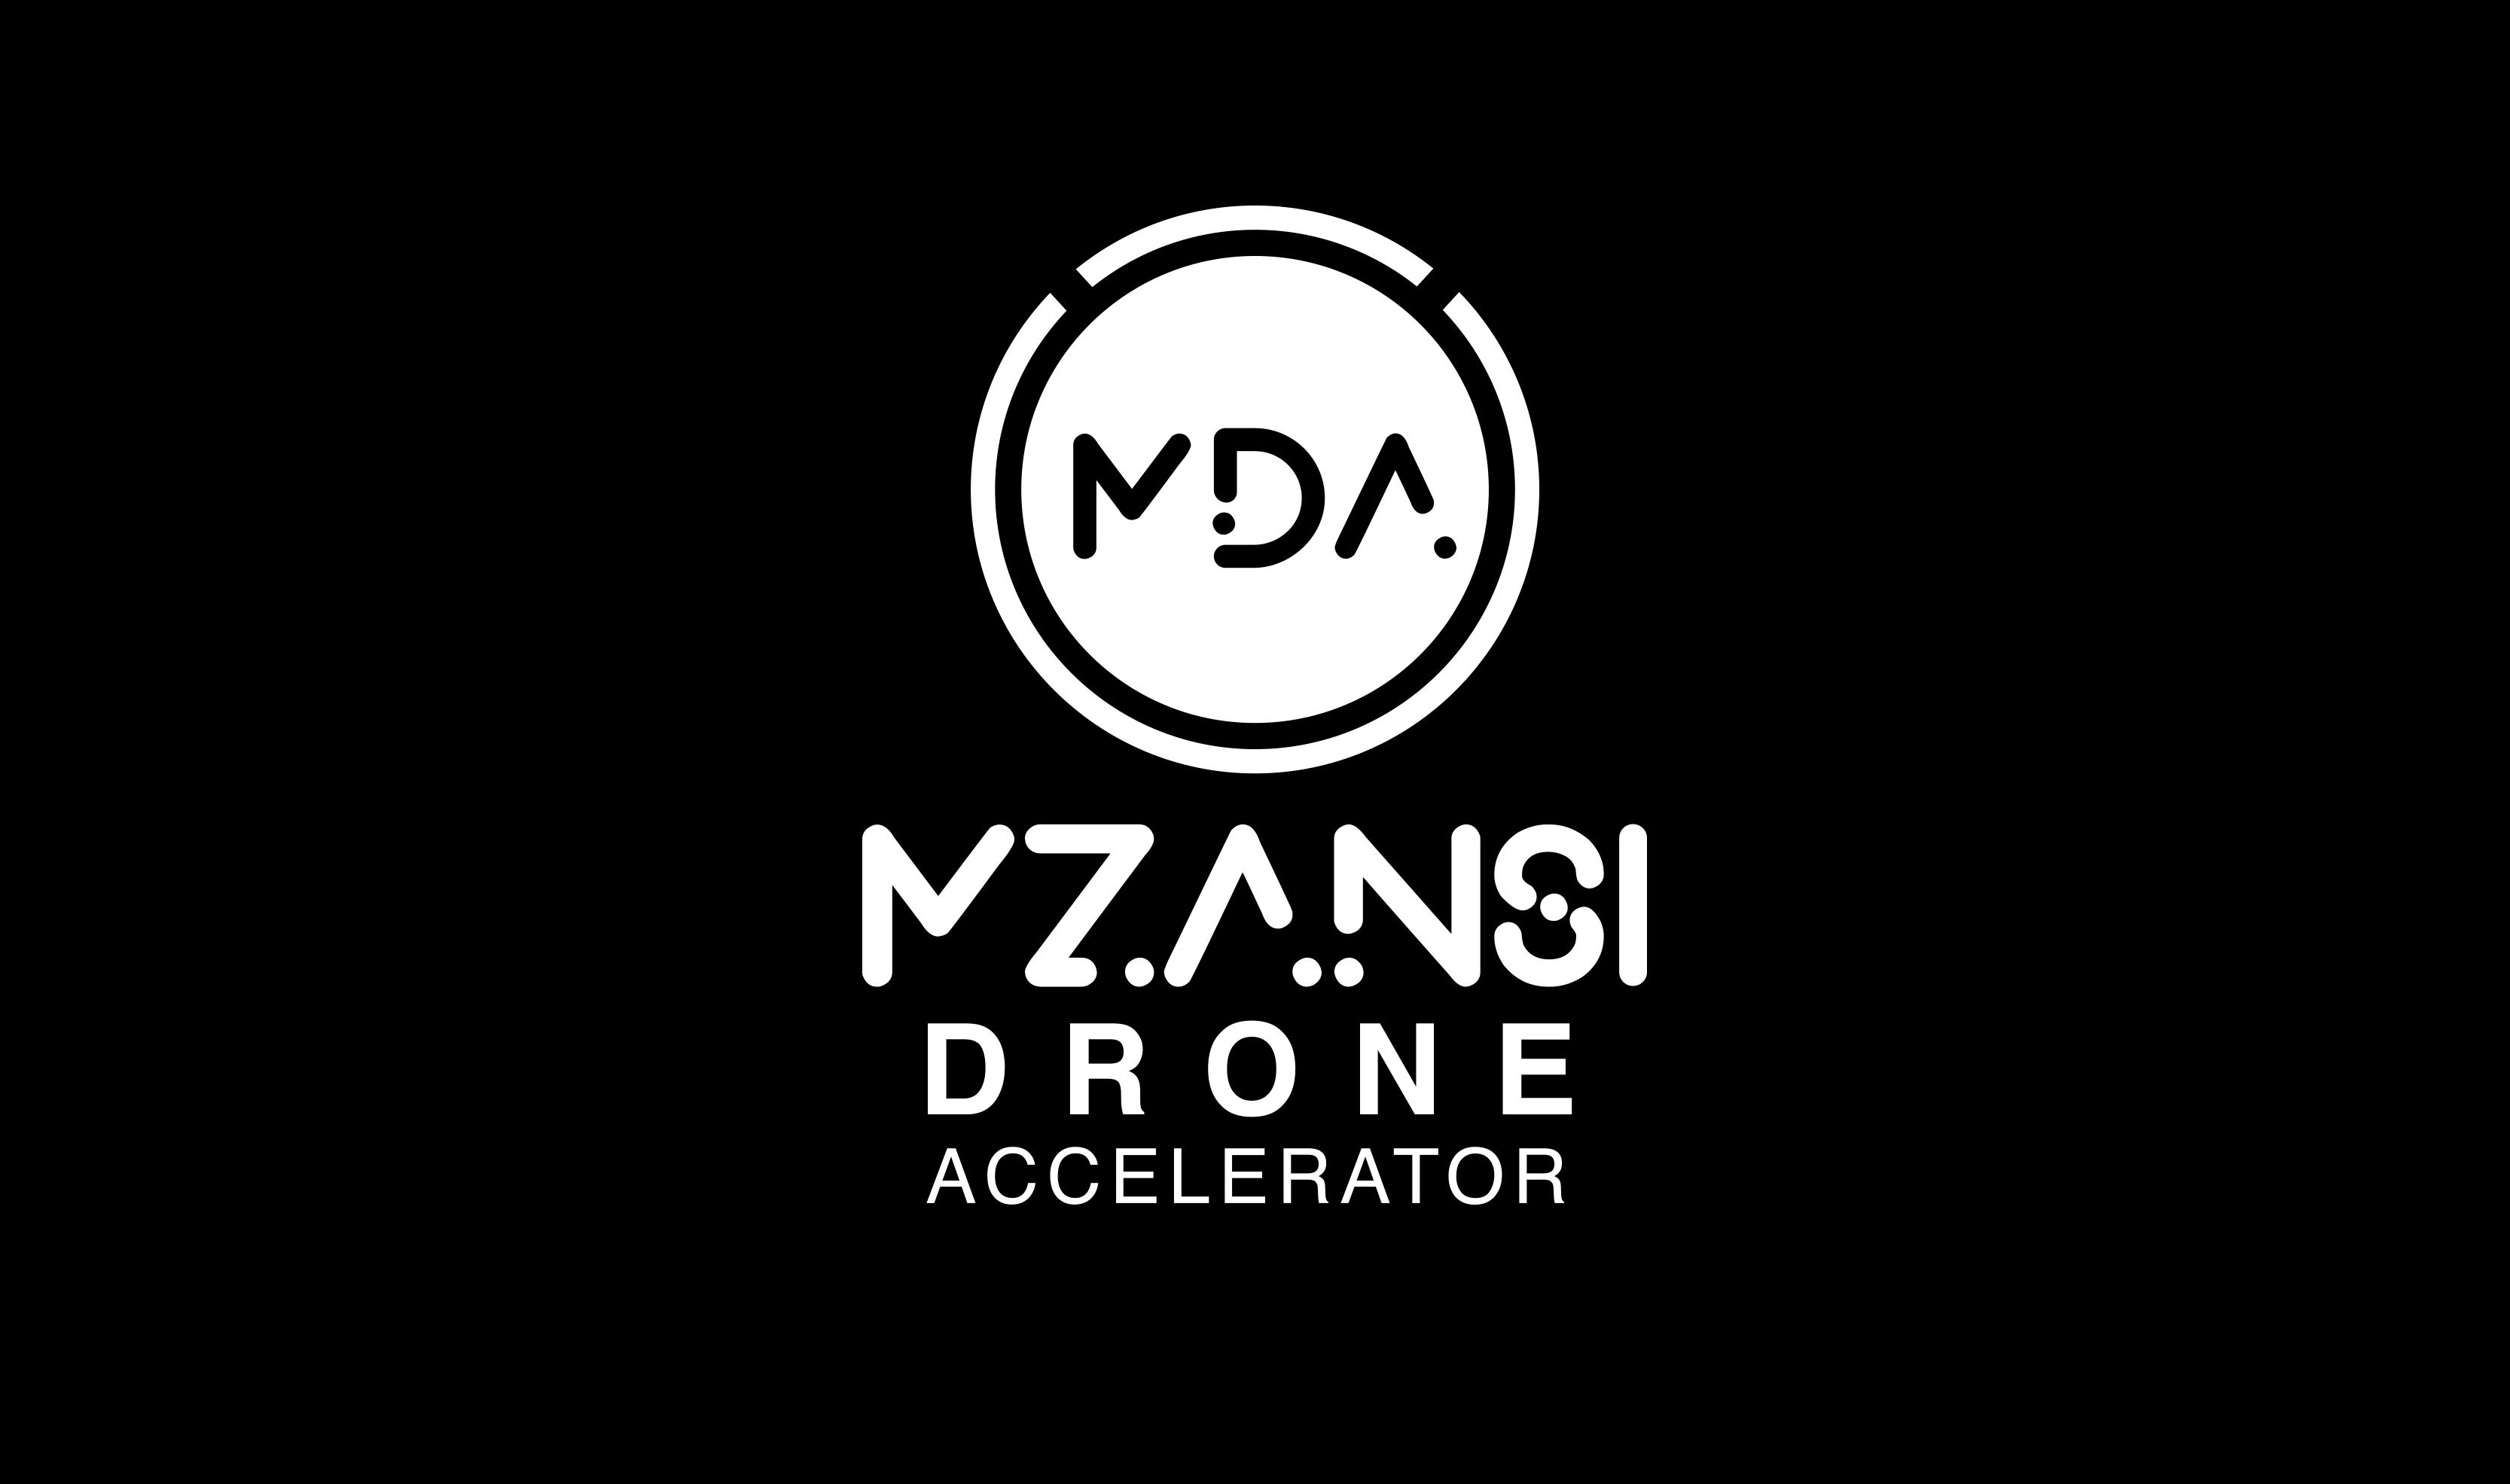 MZANSI DRONE ACCELERATOR